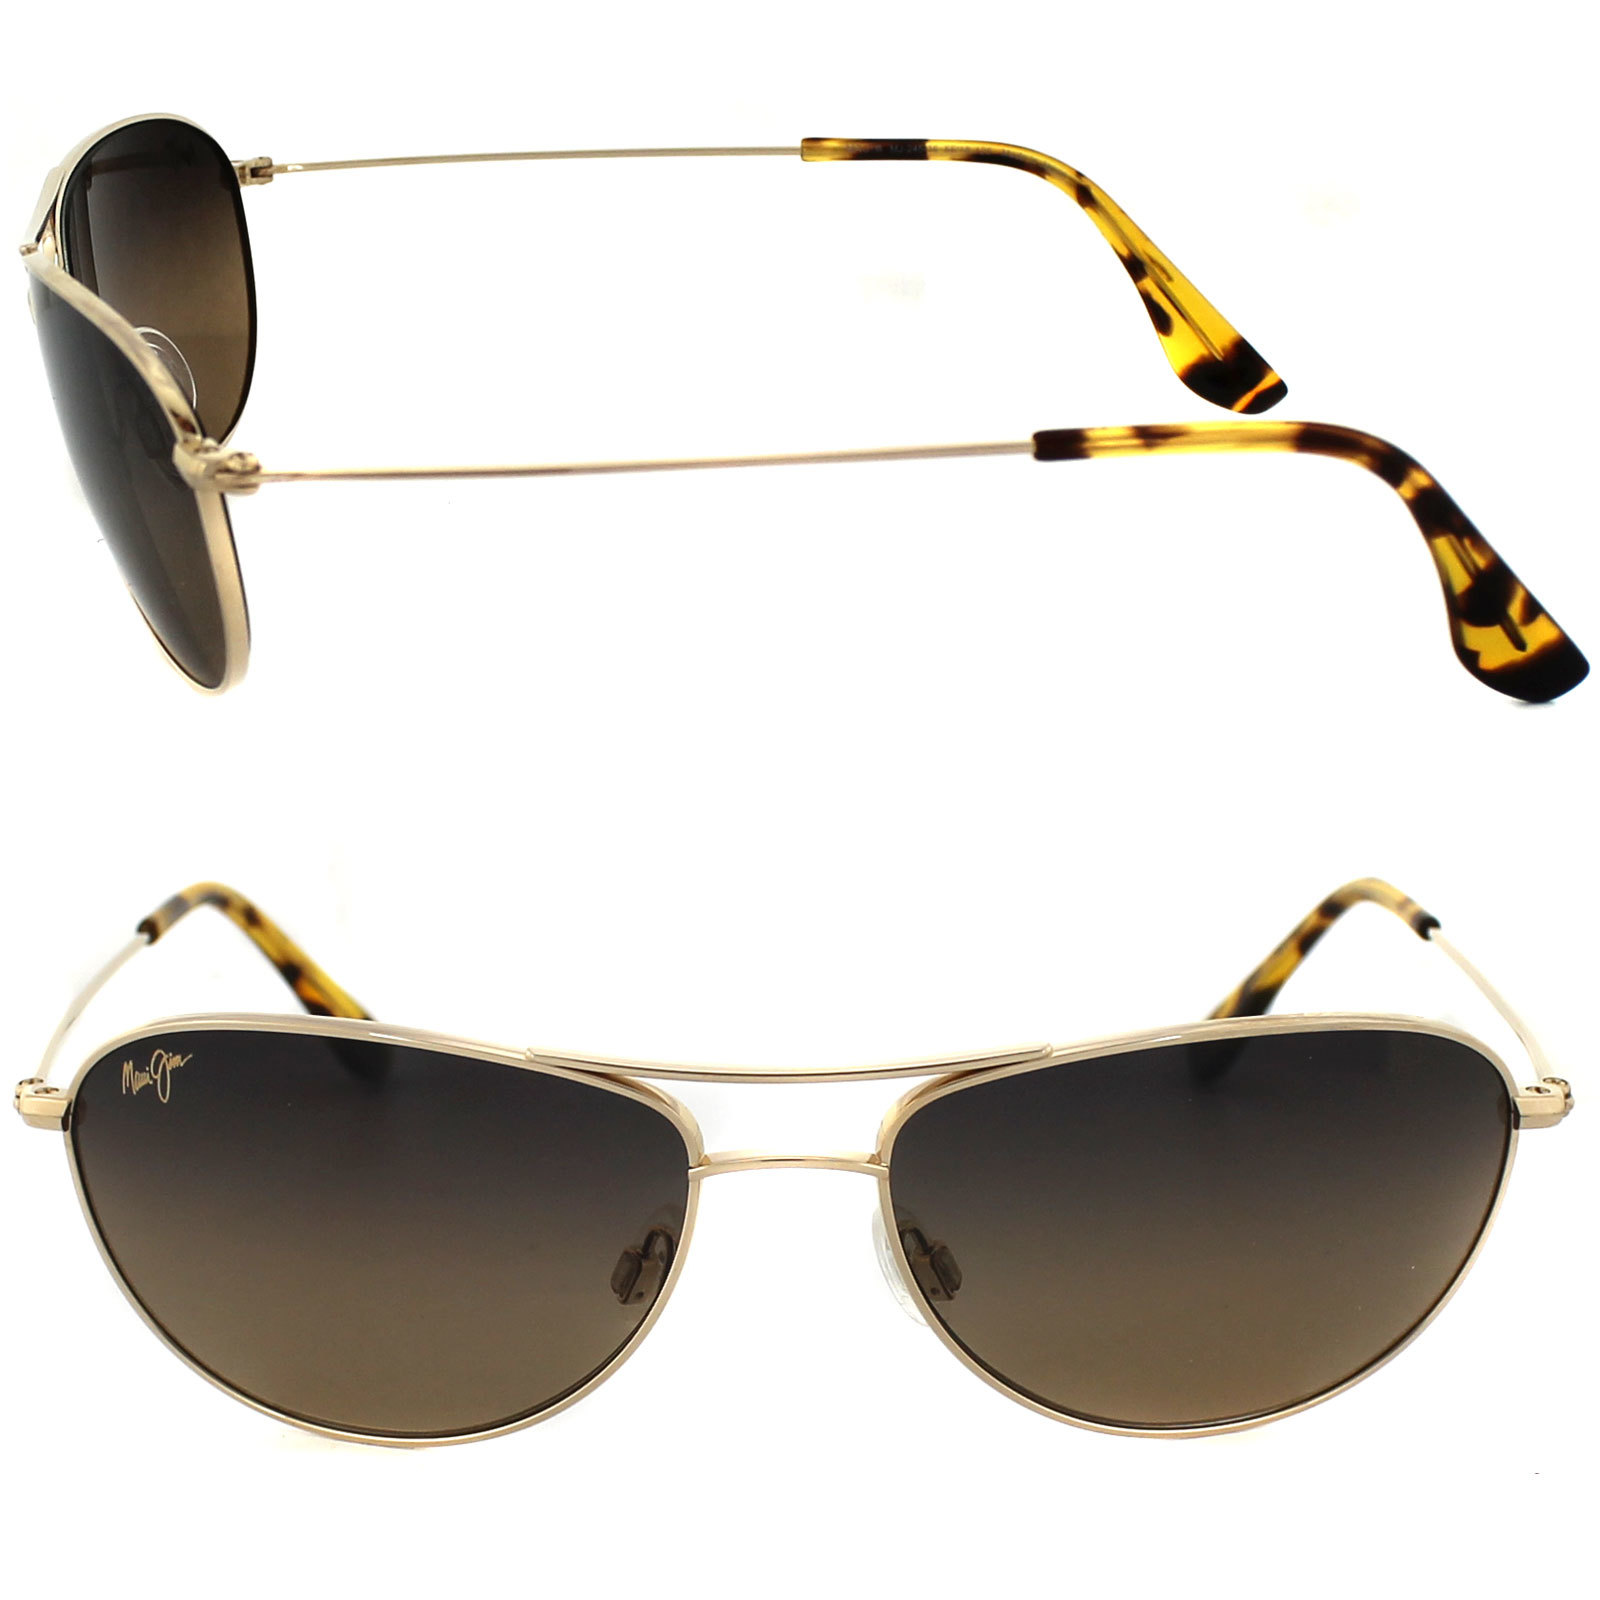 2bdbdc5807 Maui Jim HS245-16 Baby Beach Polarized Aviator Sunglasses - £154.12 GBP